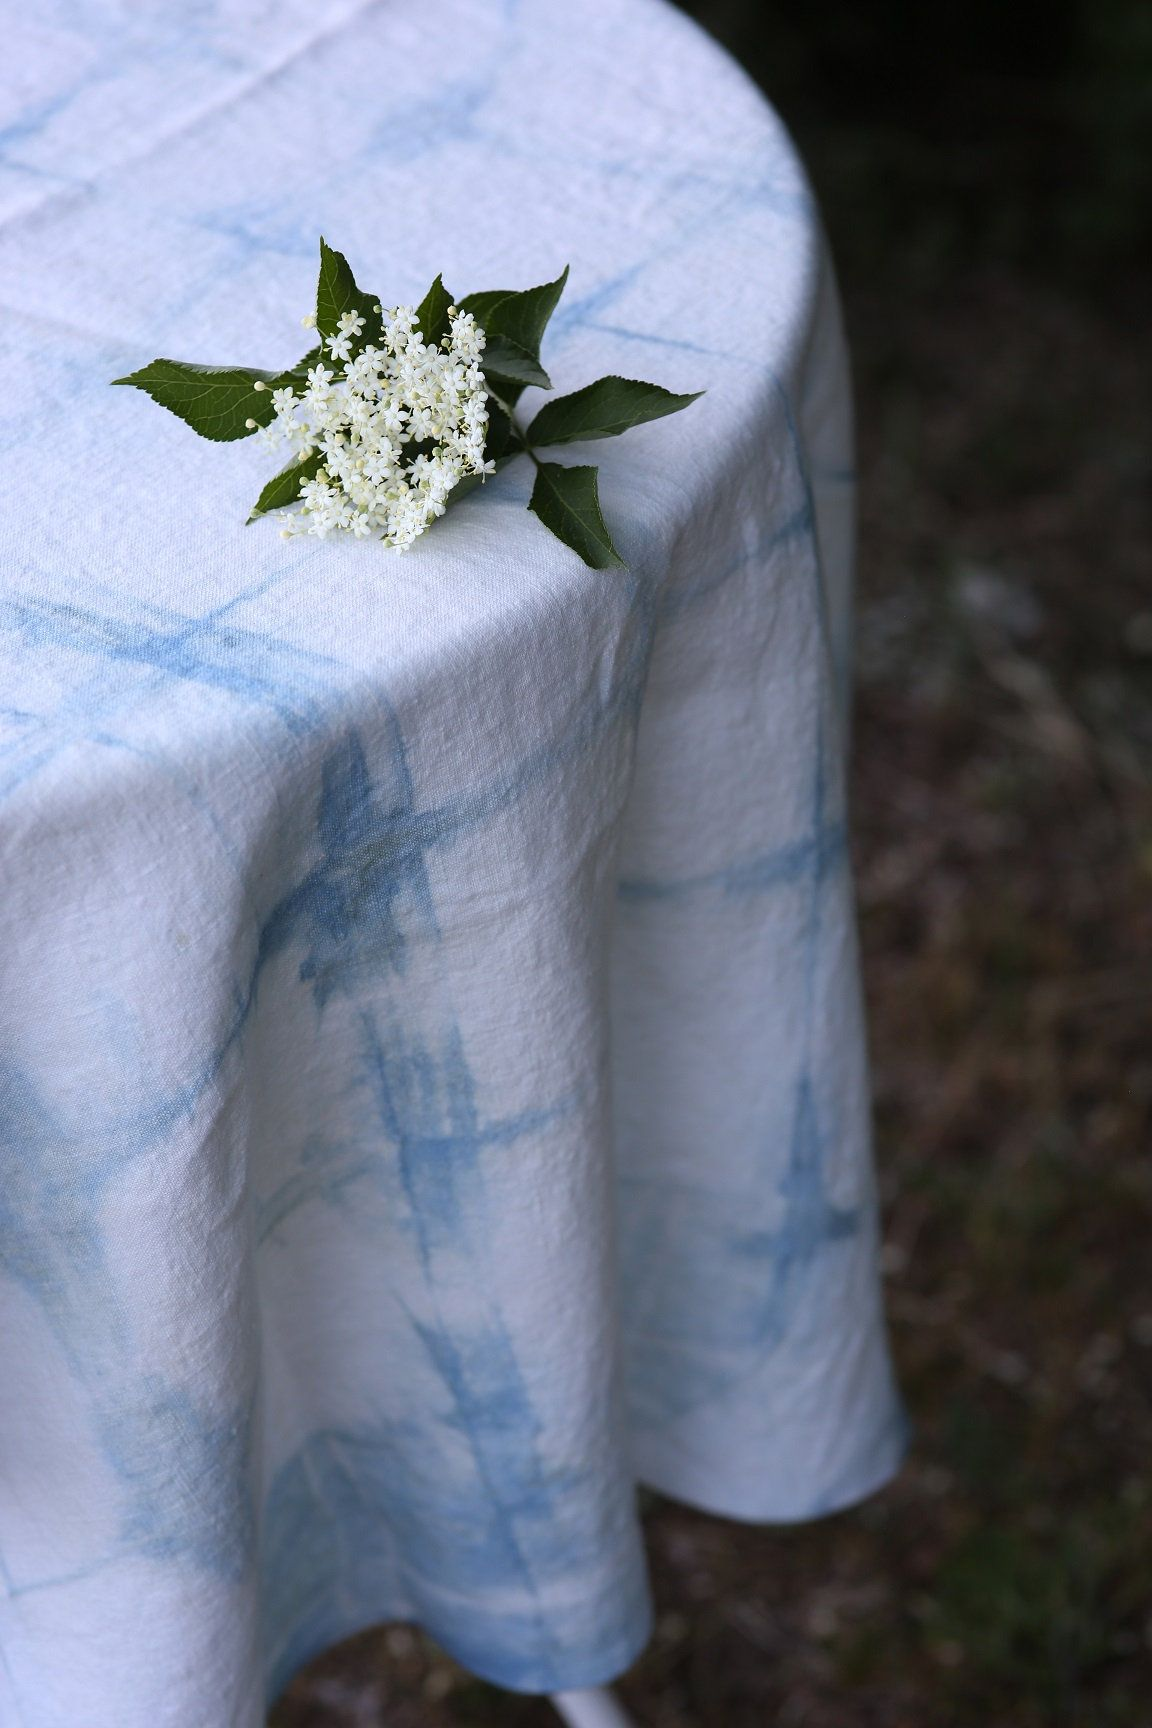 Linen Tablecloth, Organic Table Cloth, Linen Table Cloth, Blue Tablecloth,